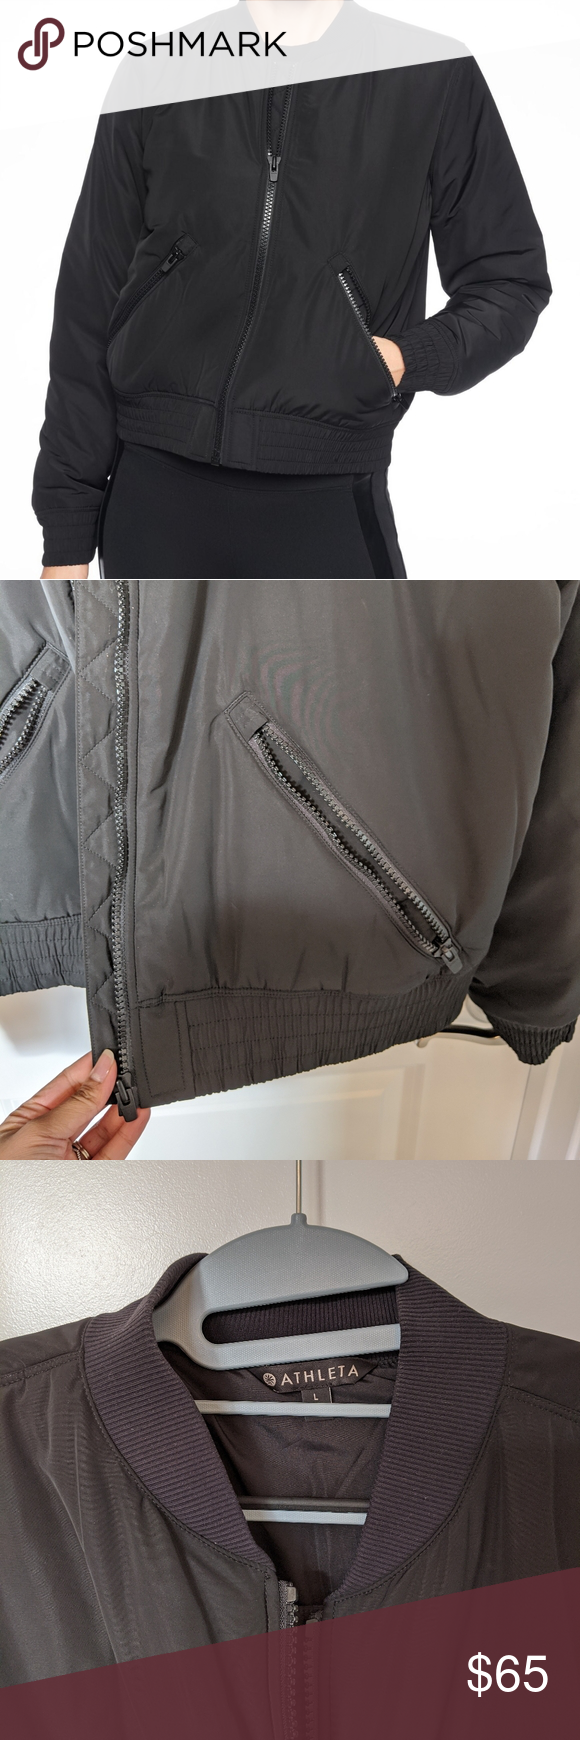 Athleta Bomber Jacket Clothes Design Fashion Bomber Jacket [ 1740 x 580 Pixel ]